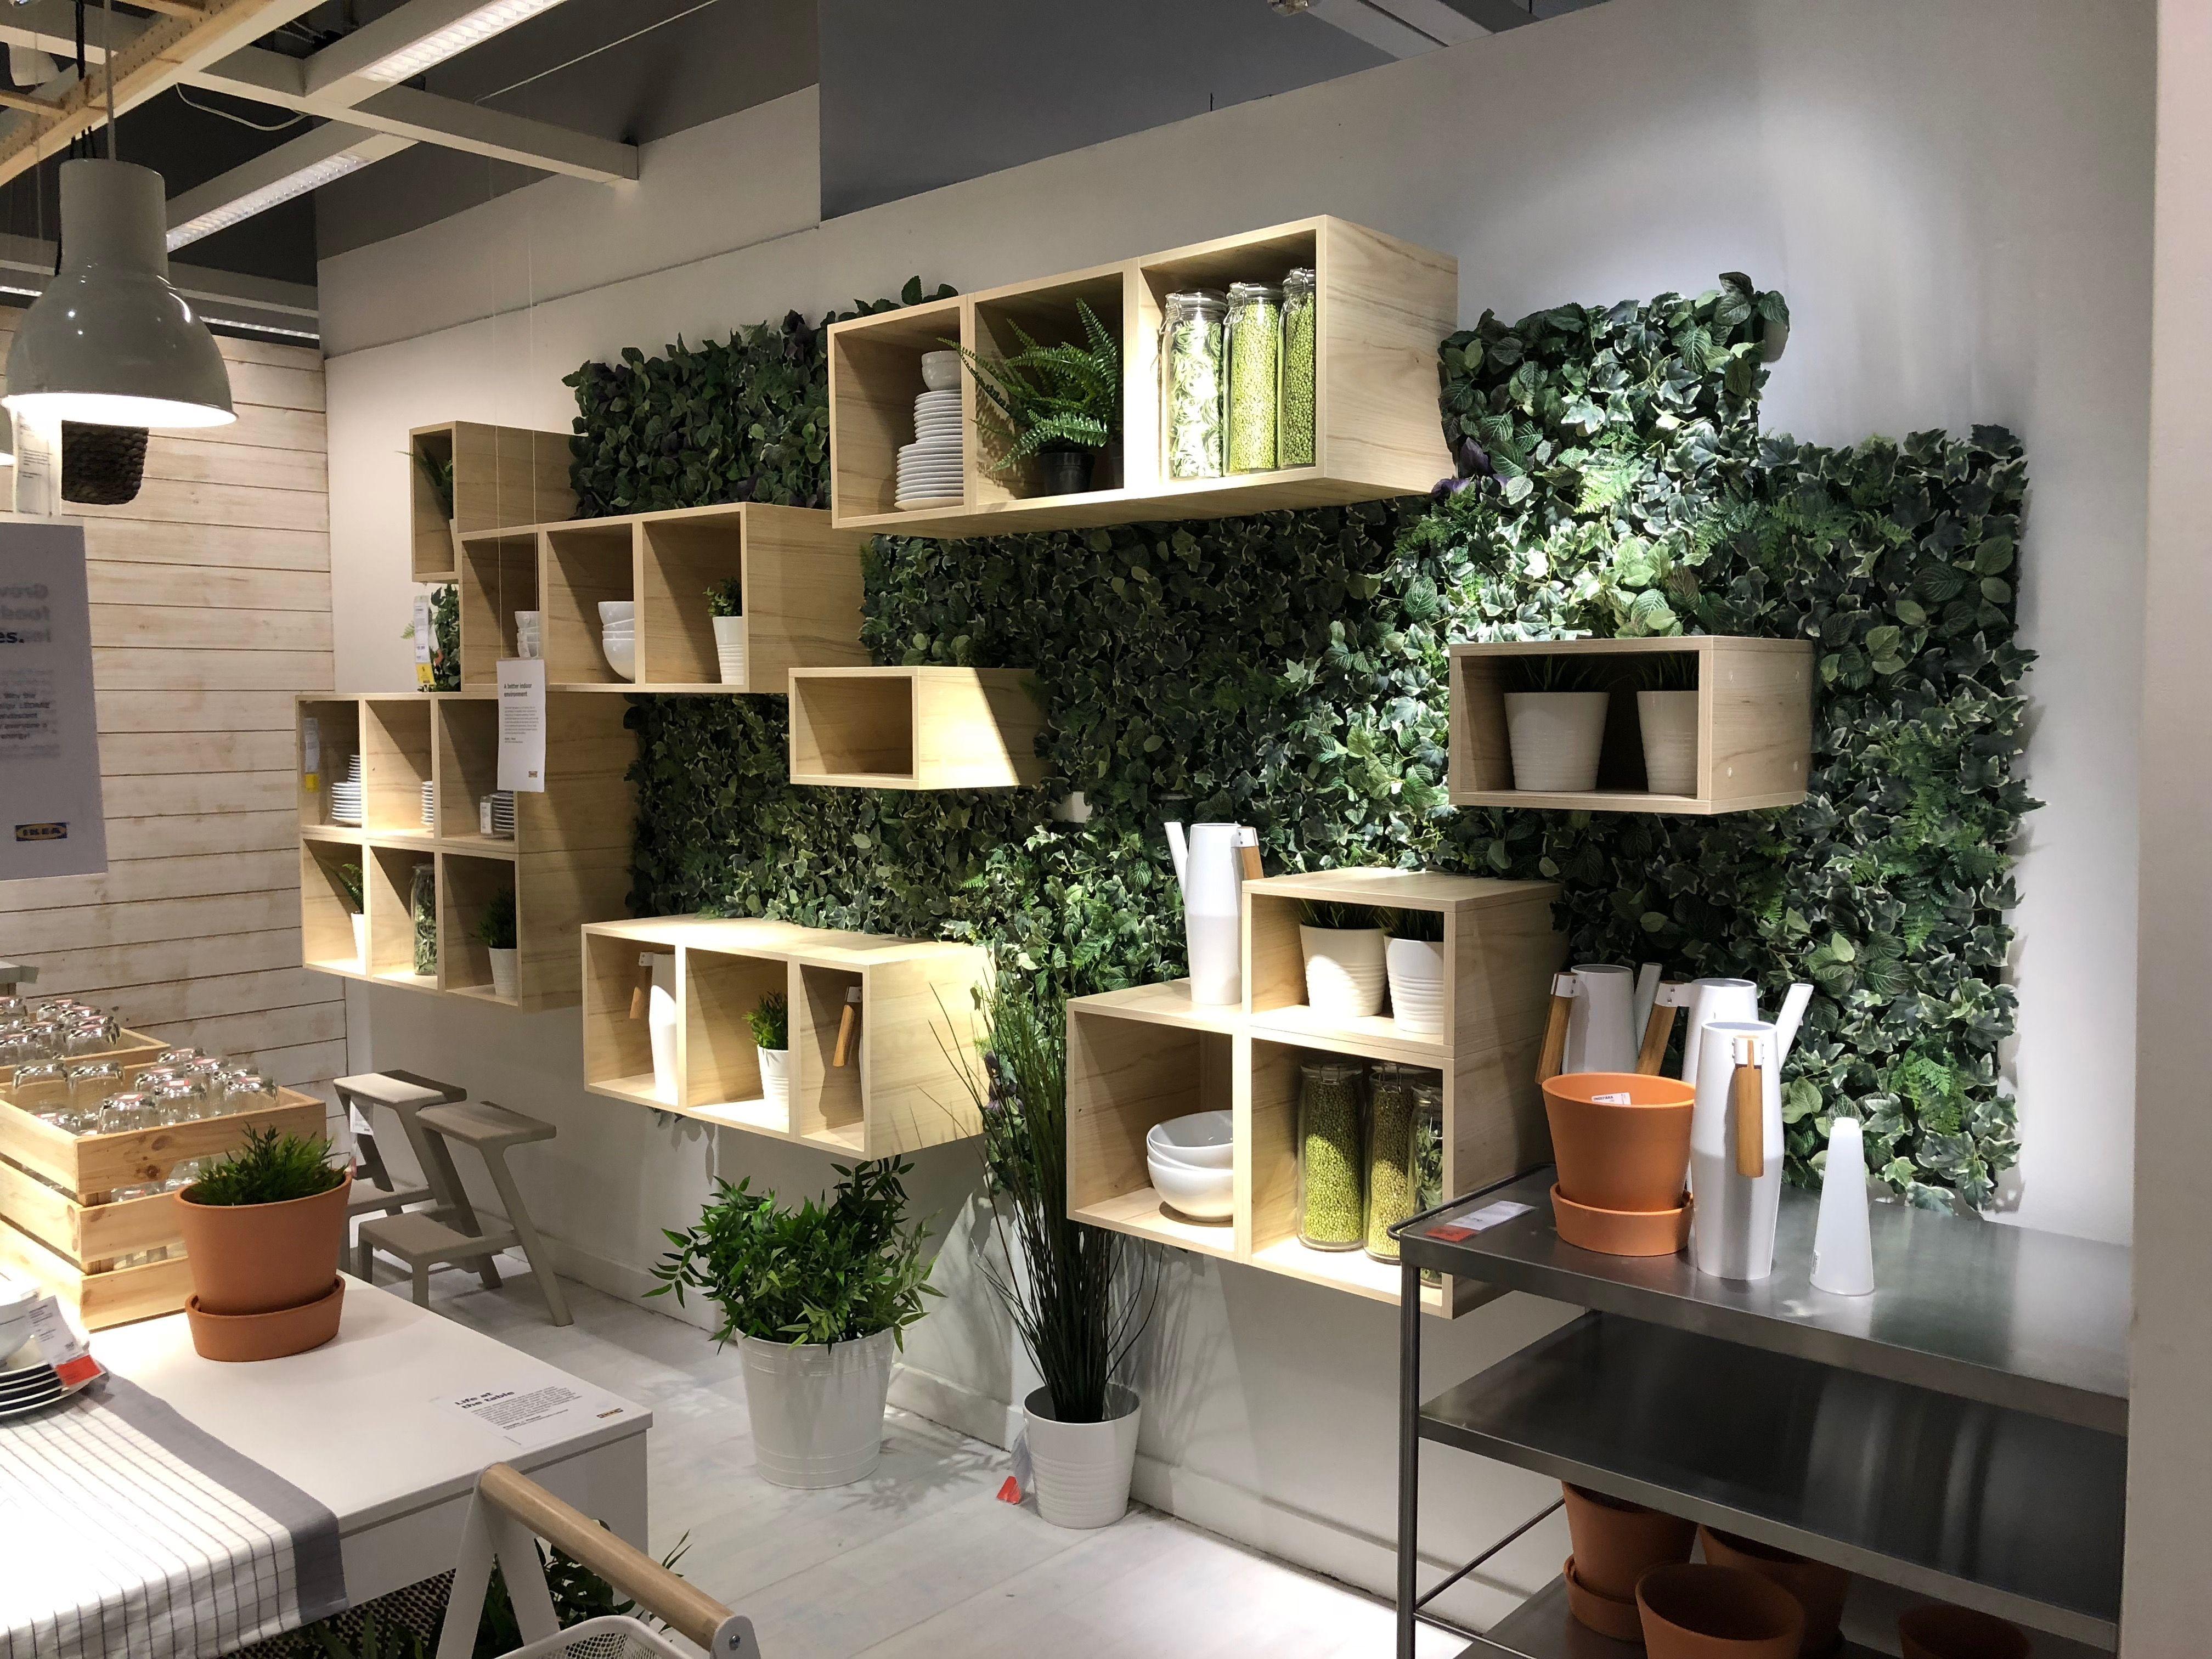 Studio Apartment Ideas By Normantrejo9 More Information